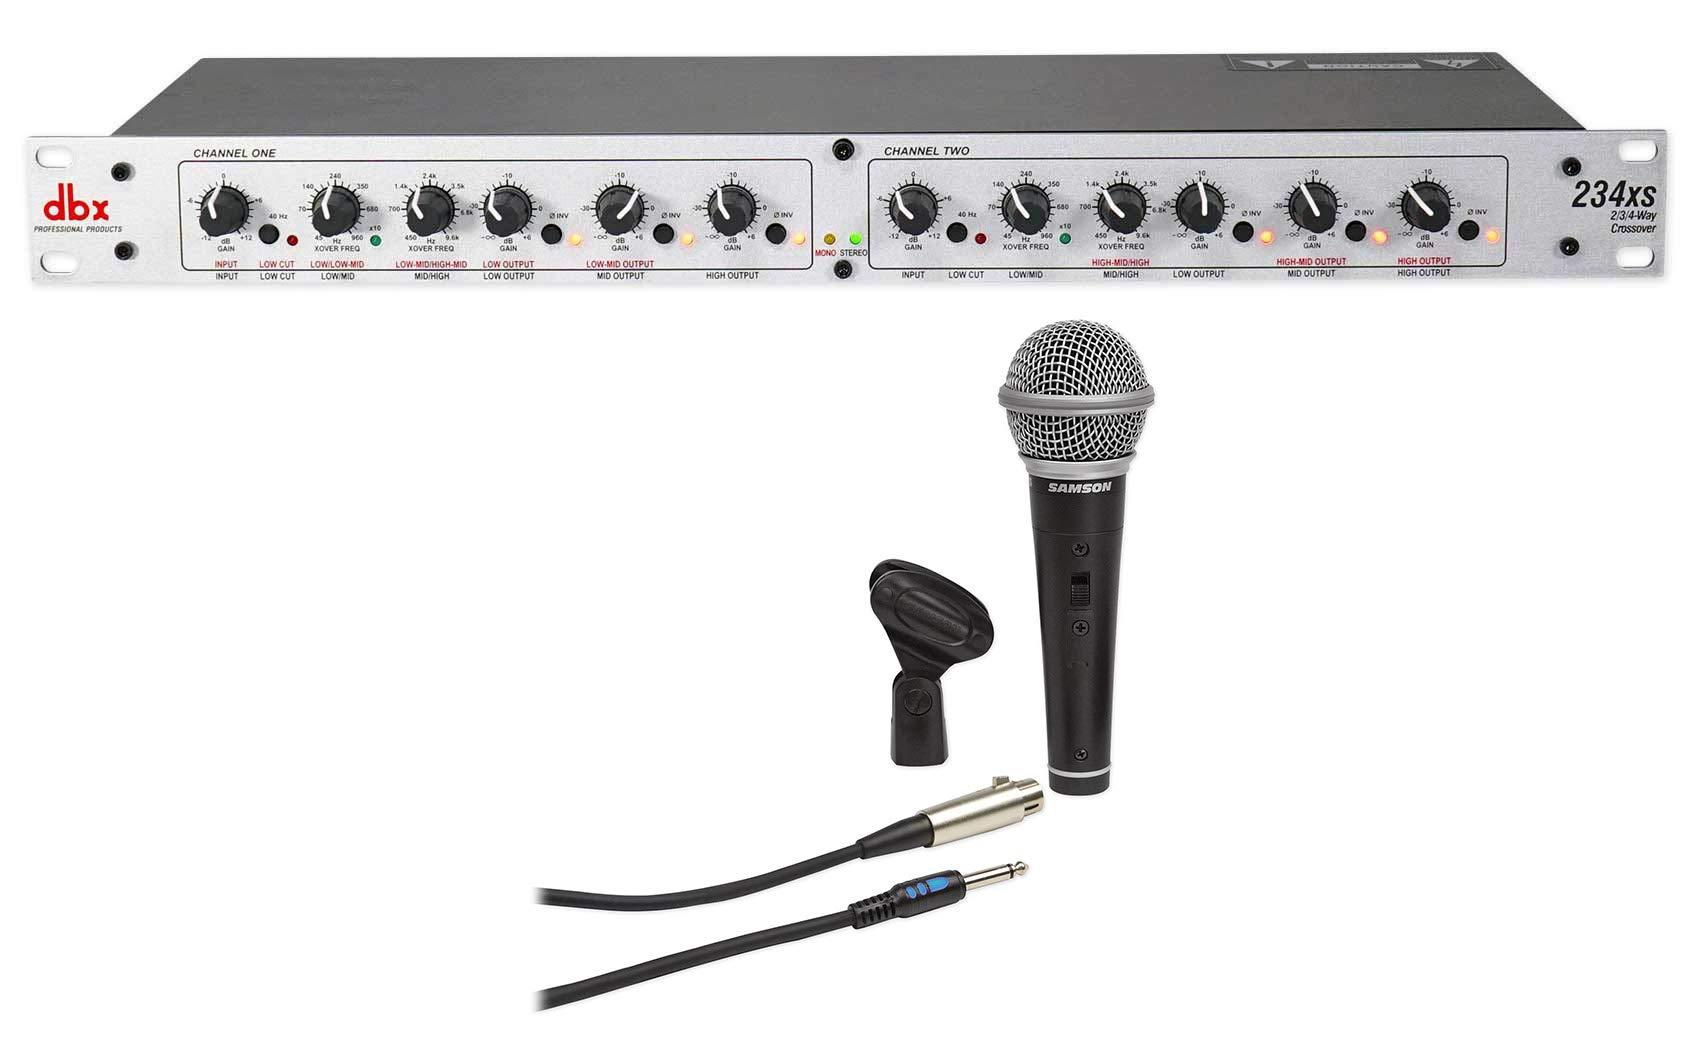 DBX 234XS Rack Mount Stereo 2/3/4-Way Crossover Sound Processor+Samson Mic